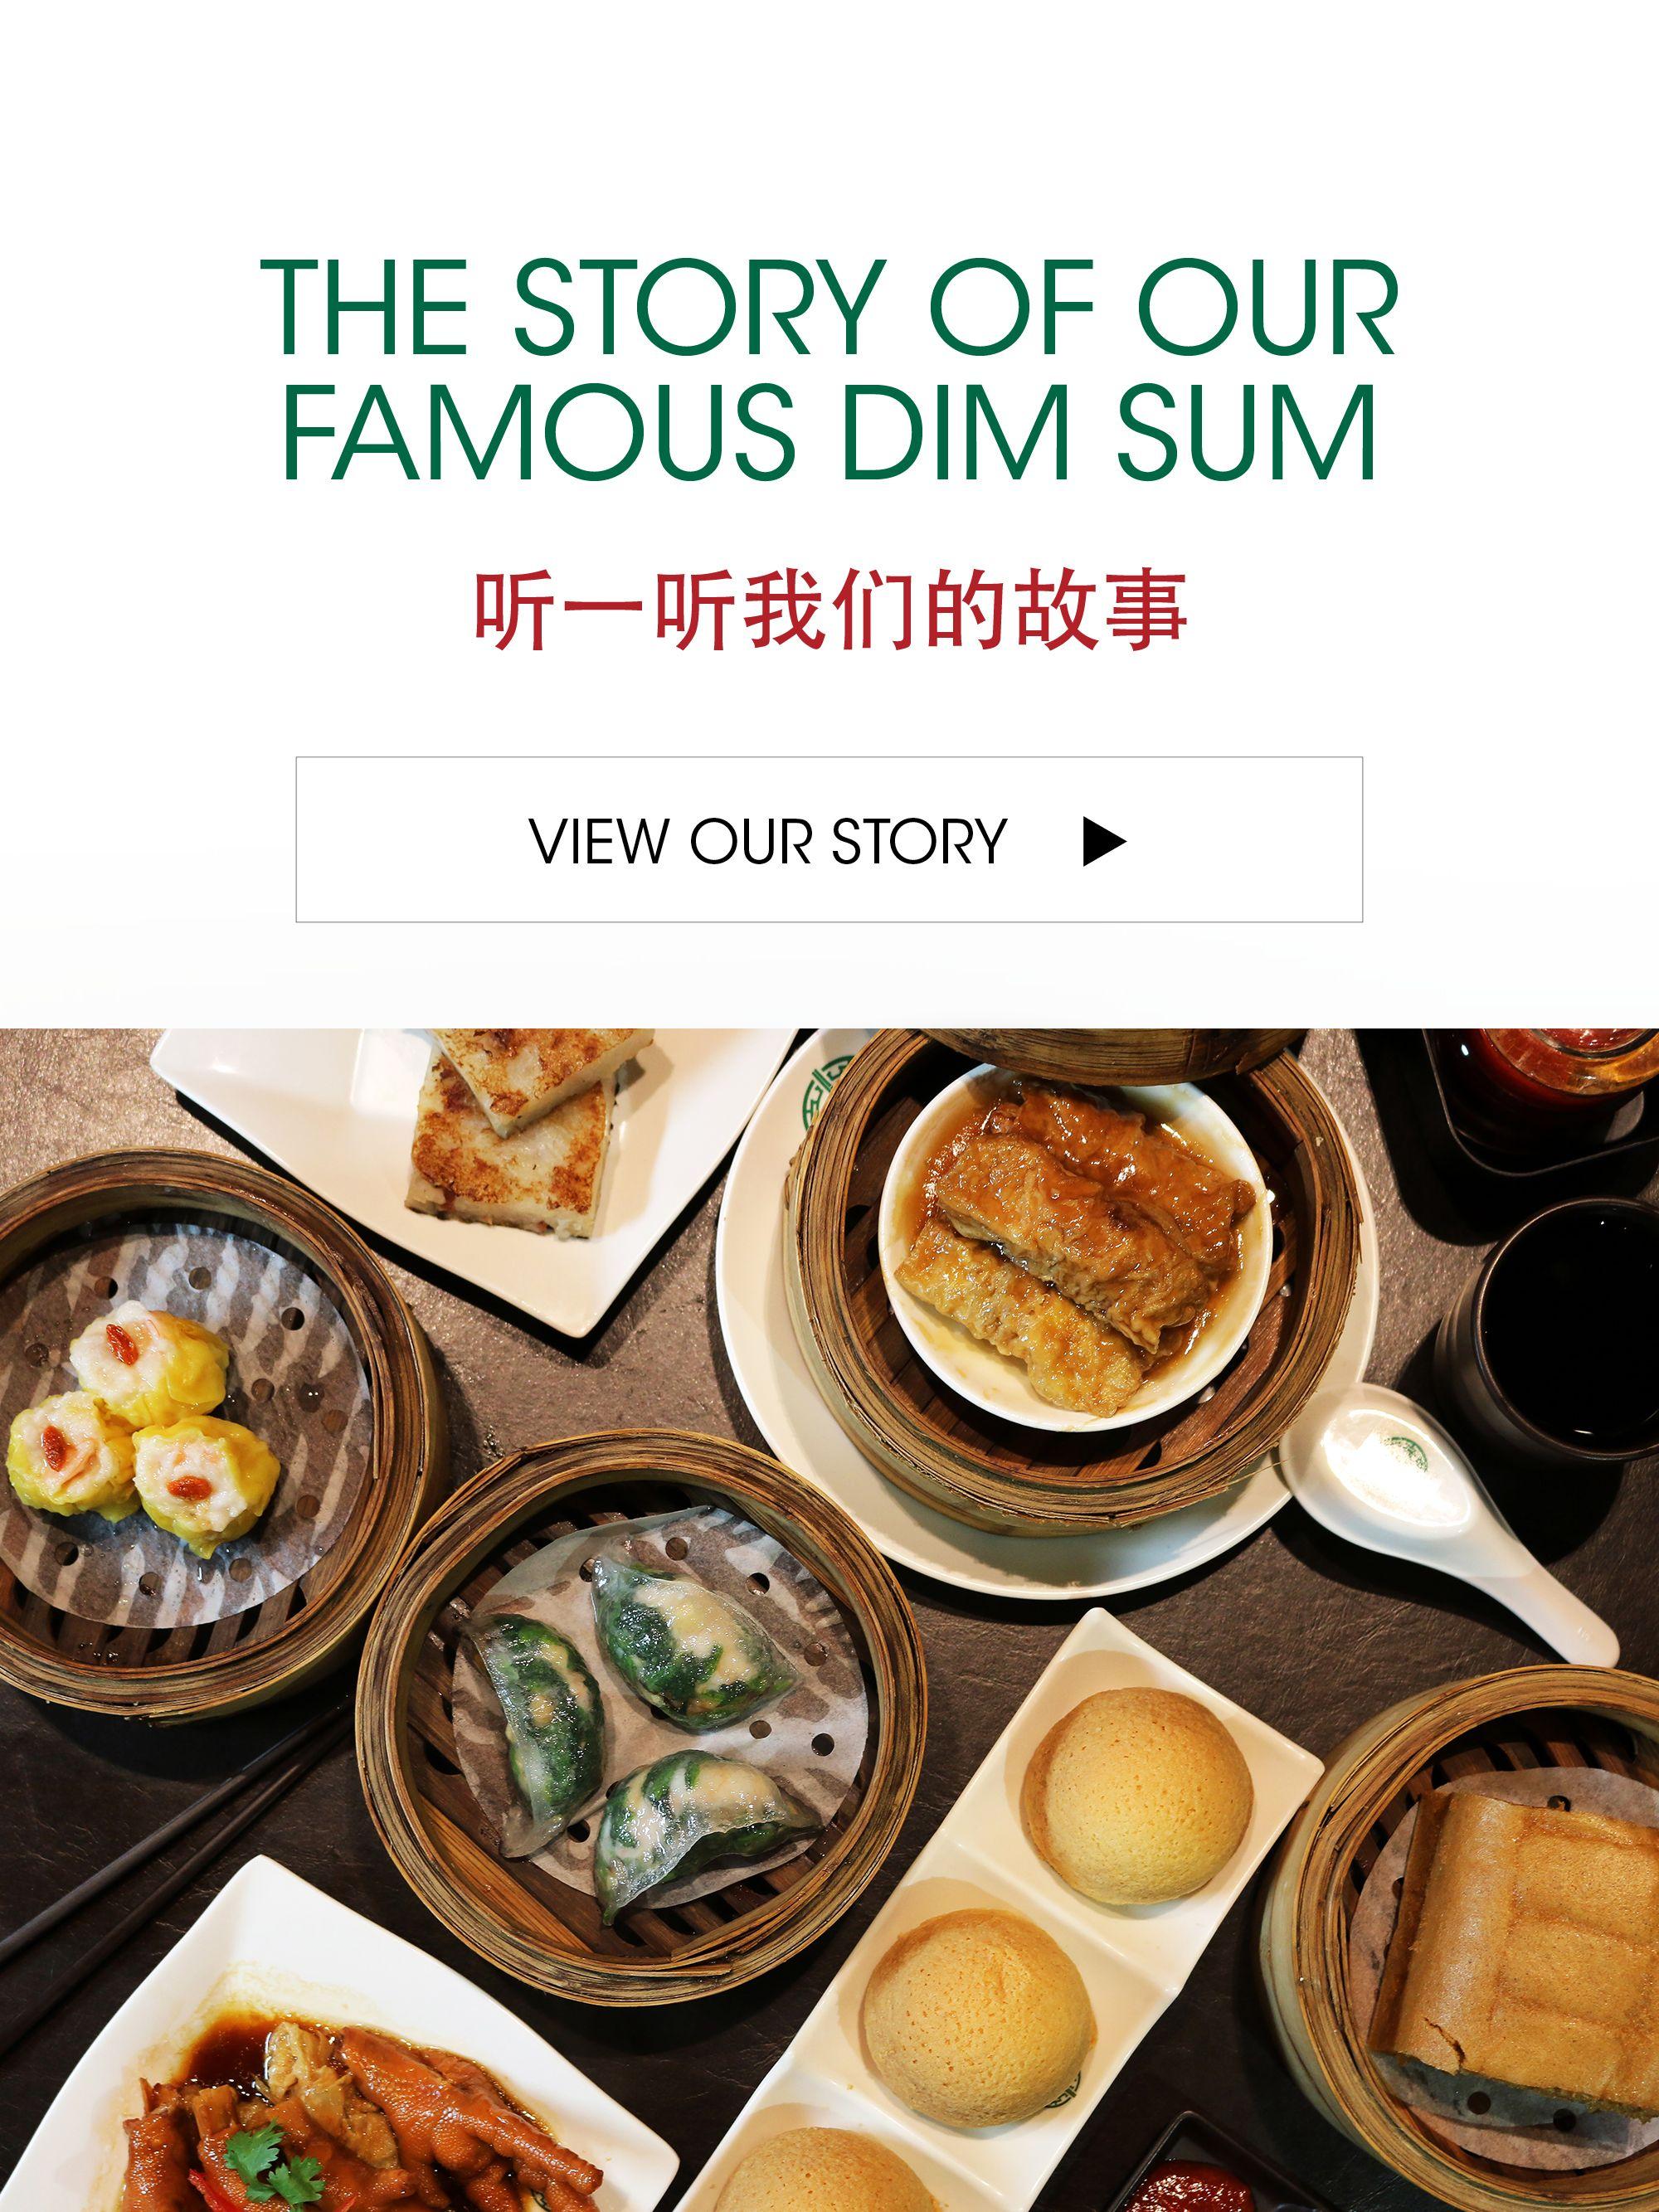 Best Hong Kong Dim Sum Yum Cha Restaurant Singapore Tim Ho Wan Dim Sum Food Critic Yum